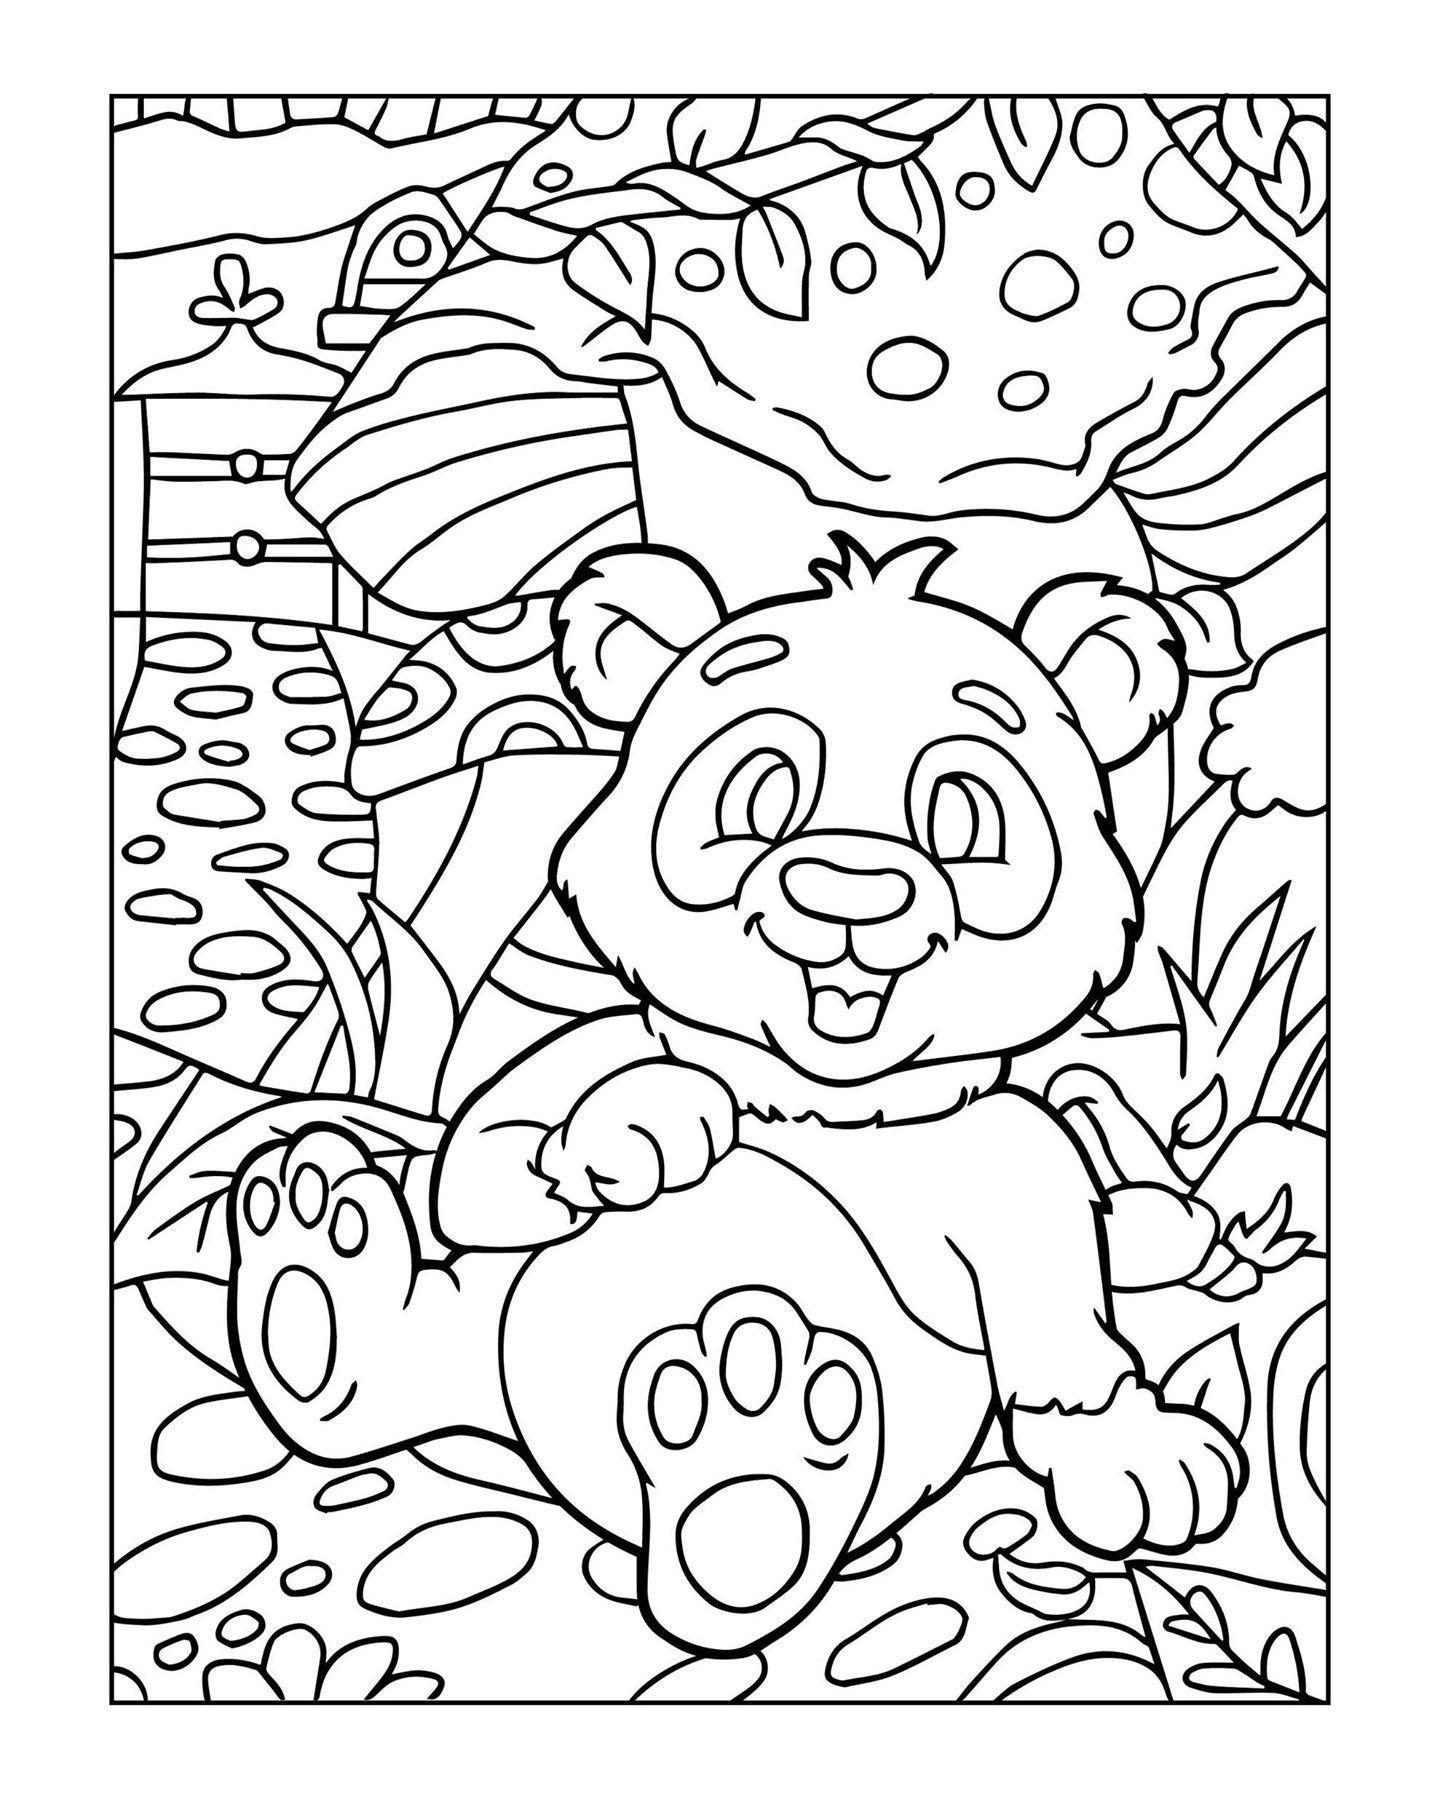 Zoo Animal Coloring Page 12 Zoo Animal Coloring Pages Animal Coloring Pages Coloring Pages